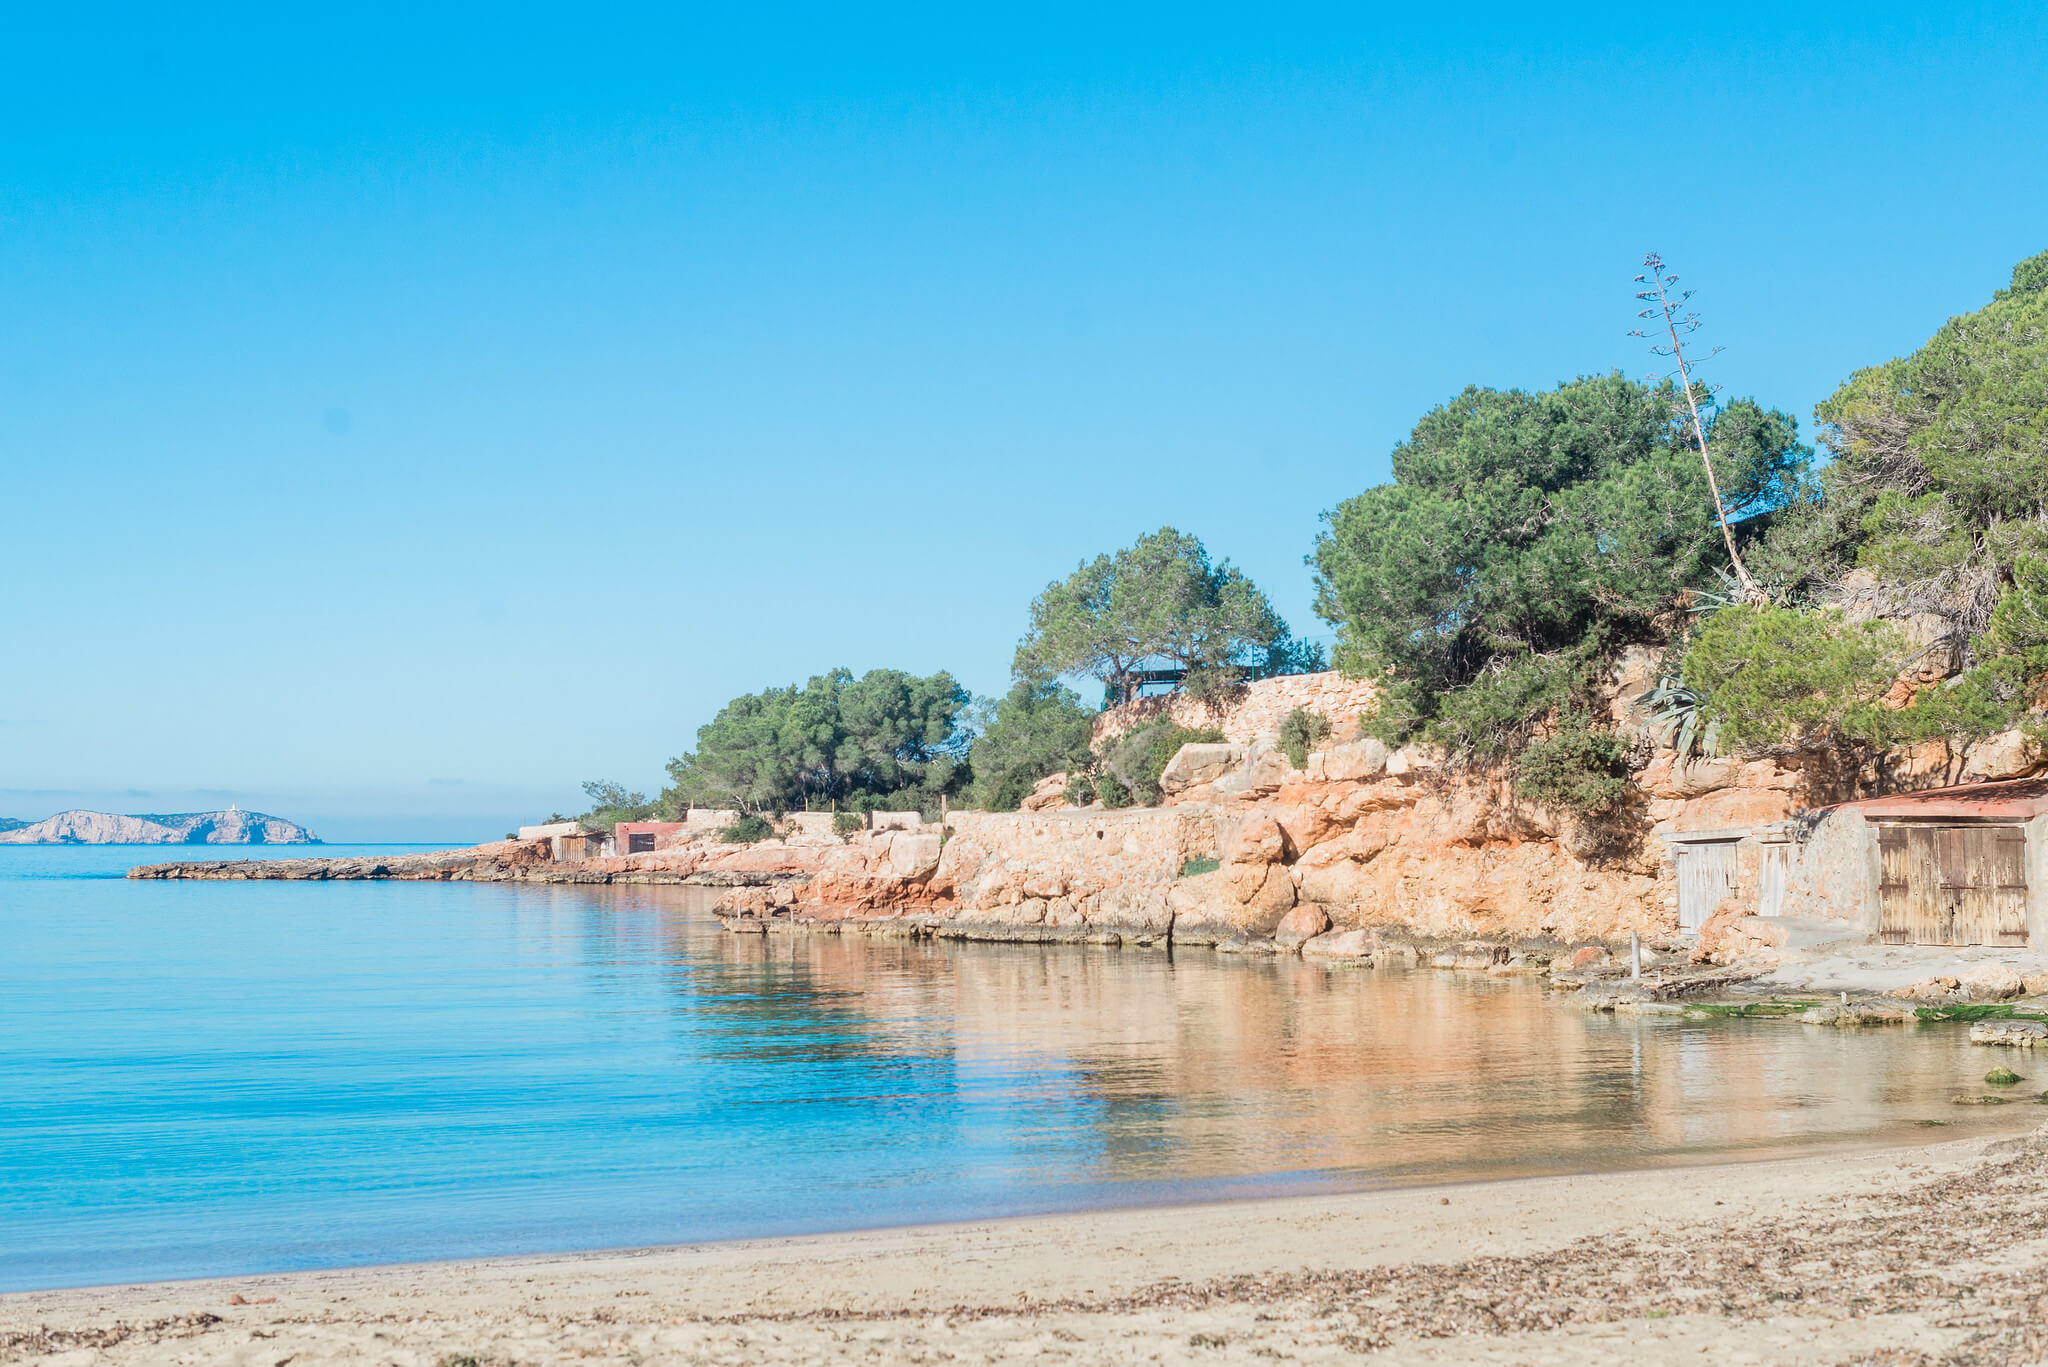 https://www.white-ibiza.com/wp-content/uploads/2020/03/ibiza-beaches-cala-gracio-02.jpg